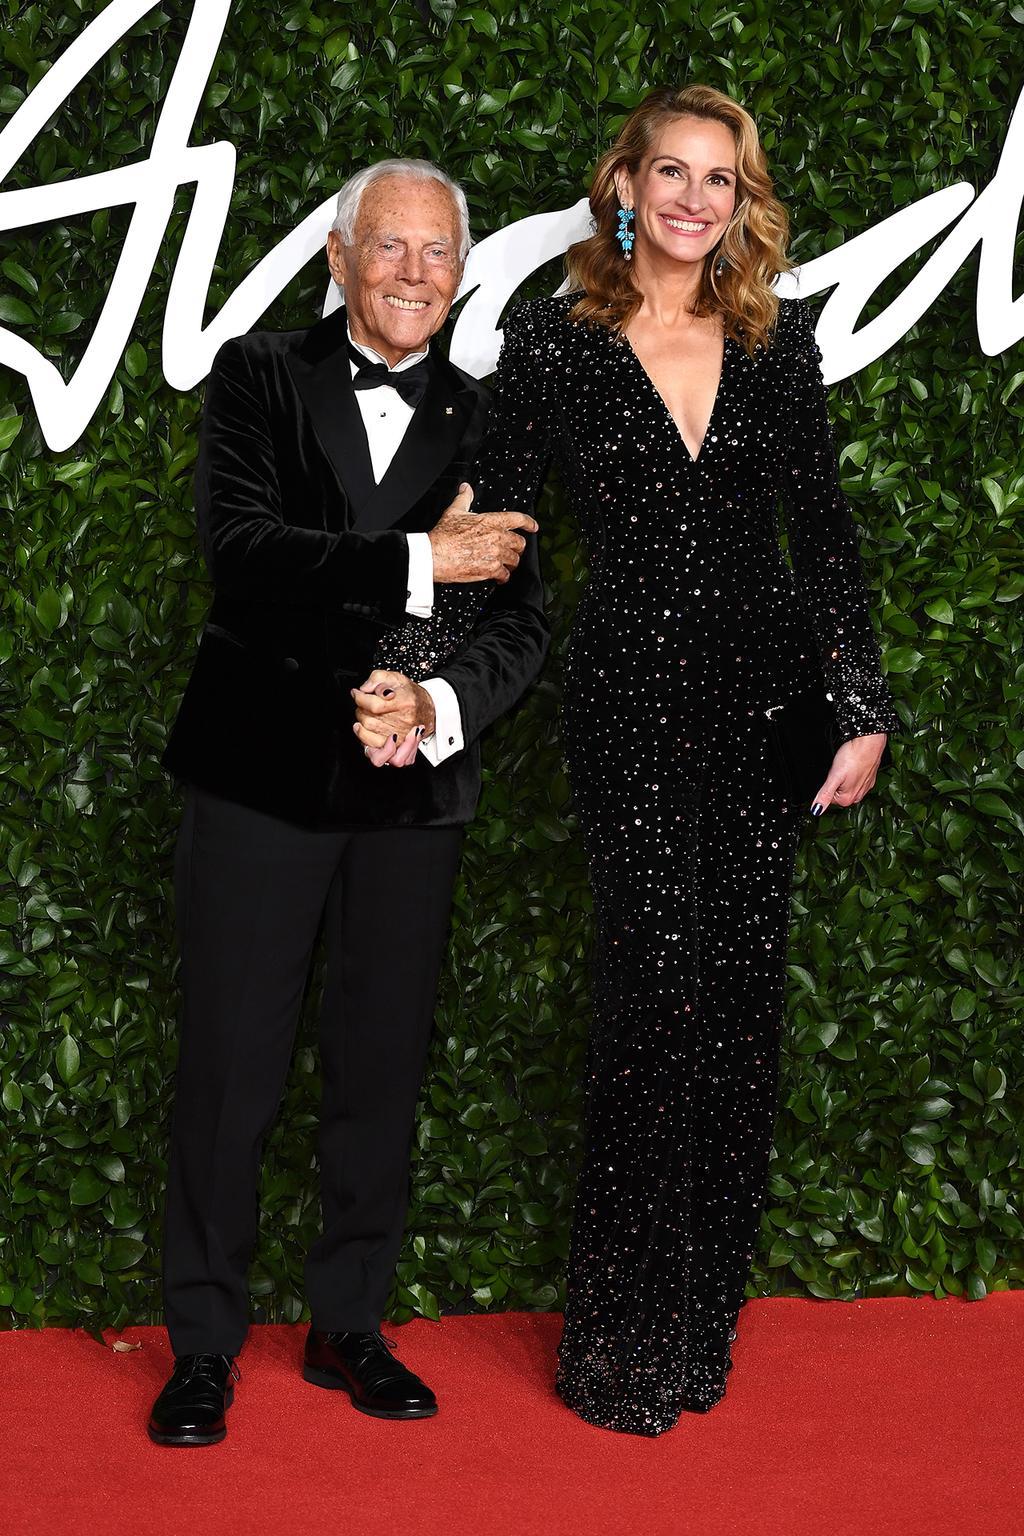 giorgio-armani-julia-roberts-wearing-armani-2019-british-fashion-council-awards